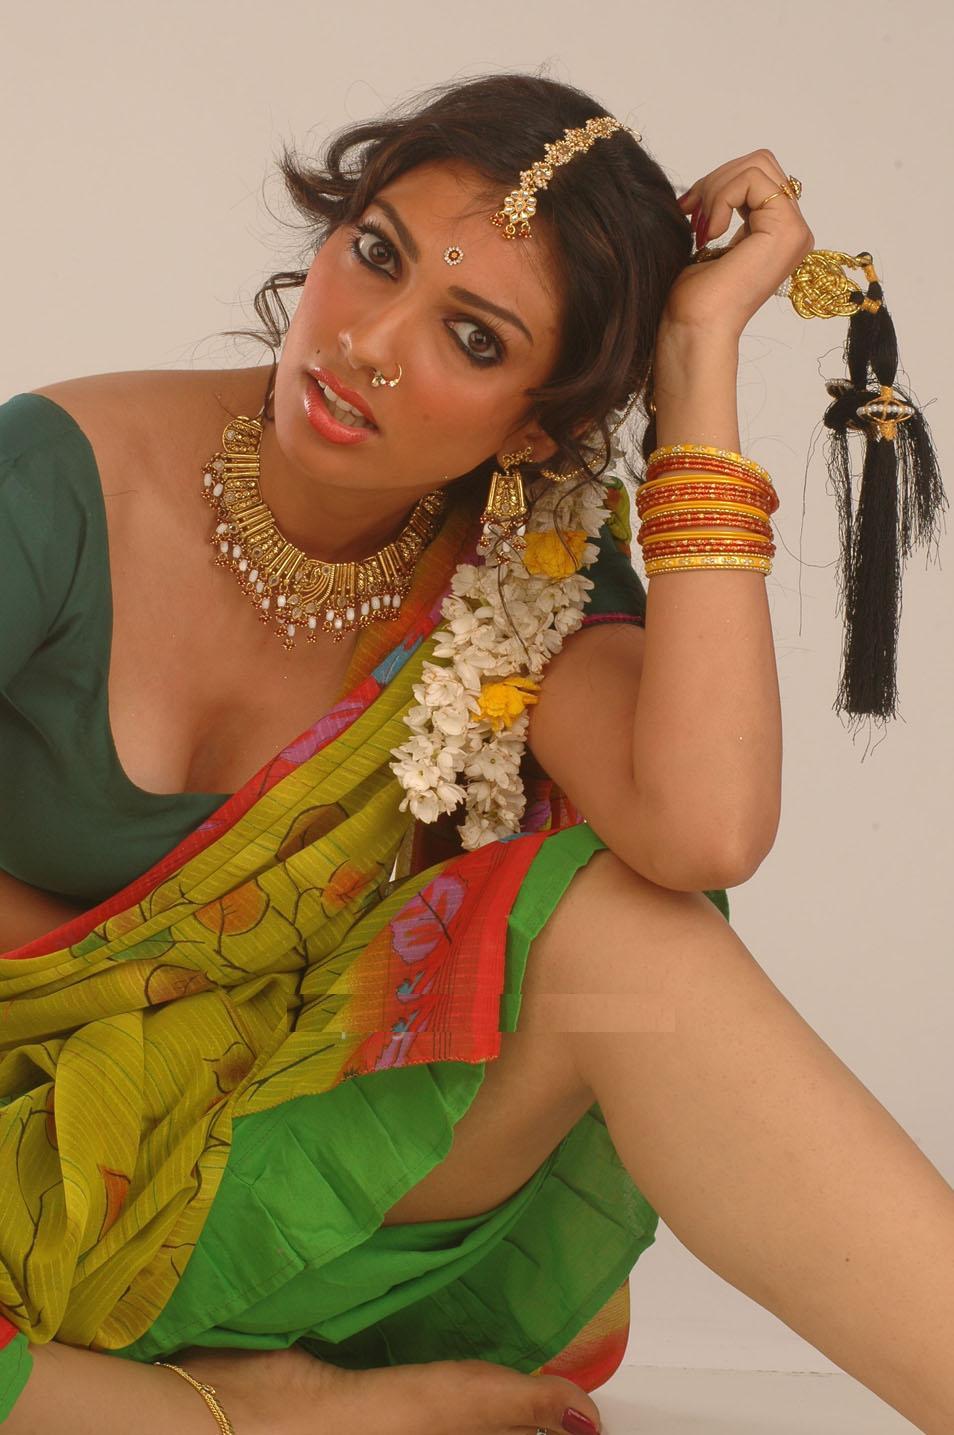 Forum on this topic: Chara, yukta-mookhey/